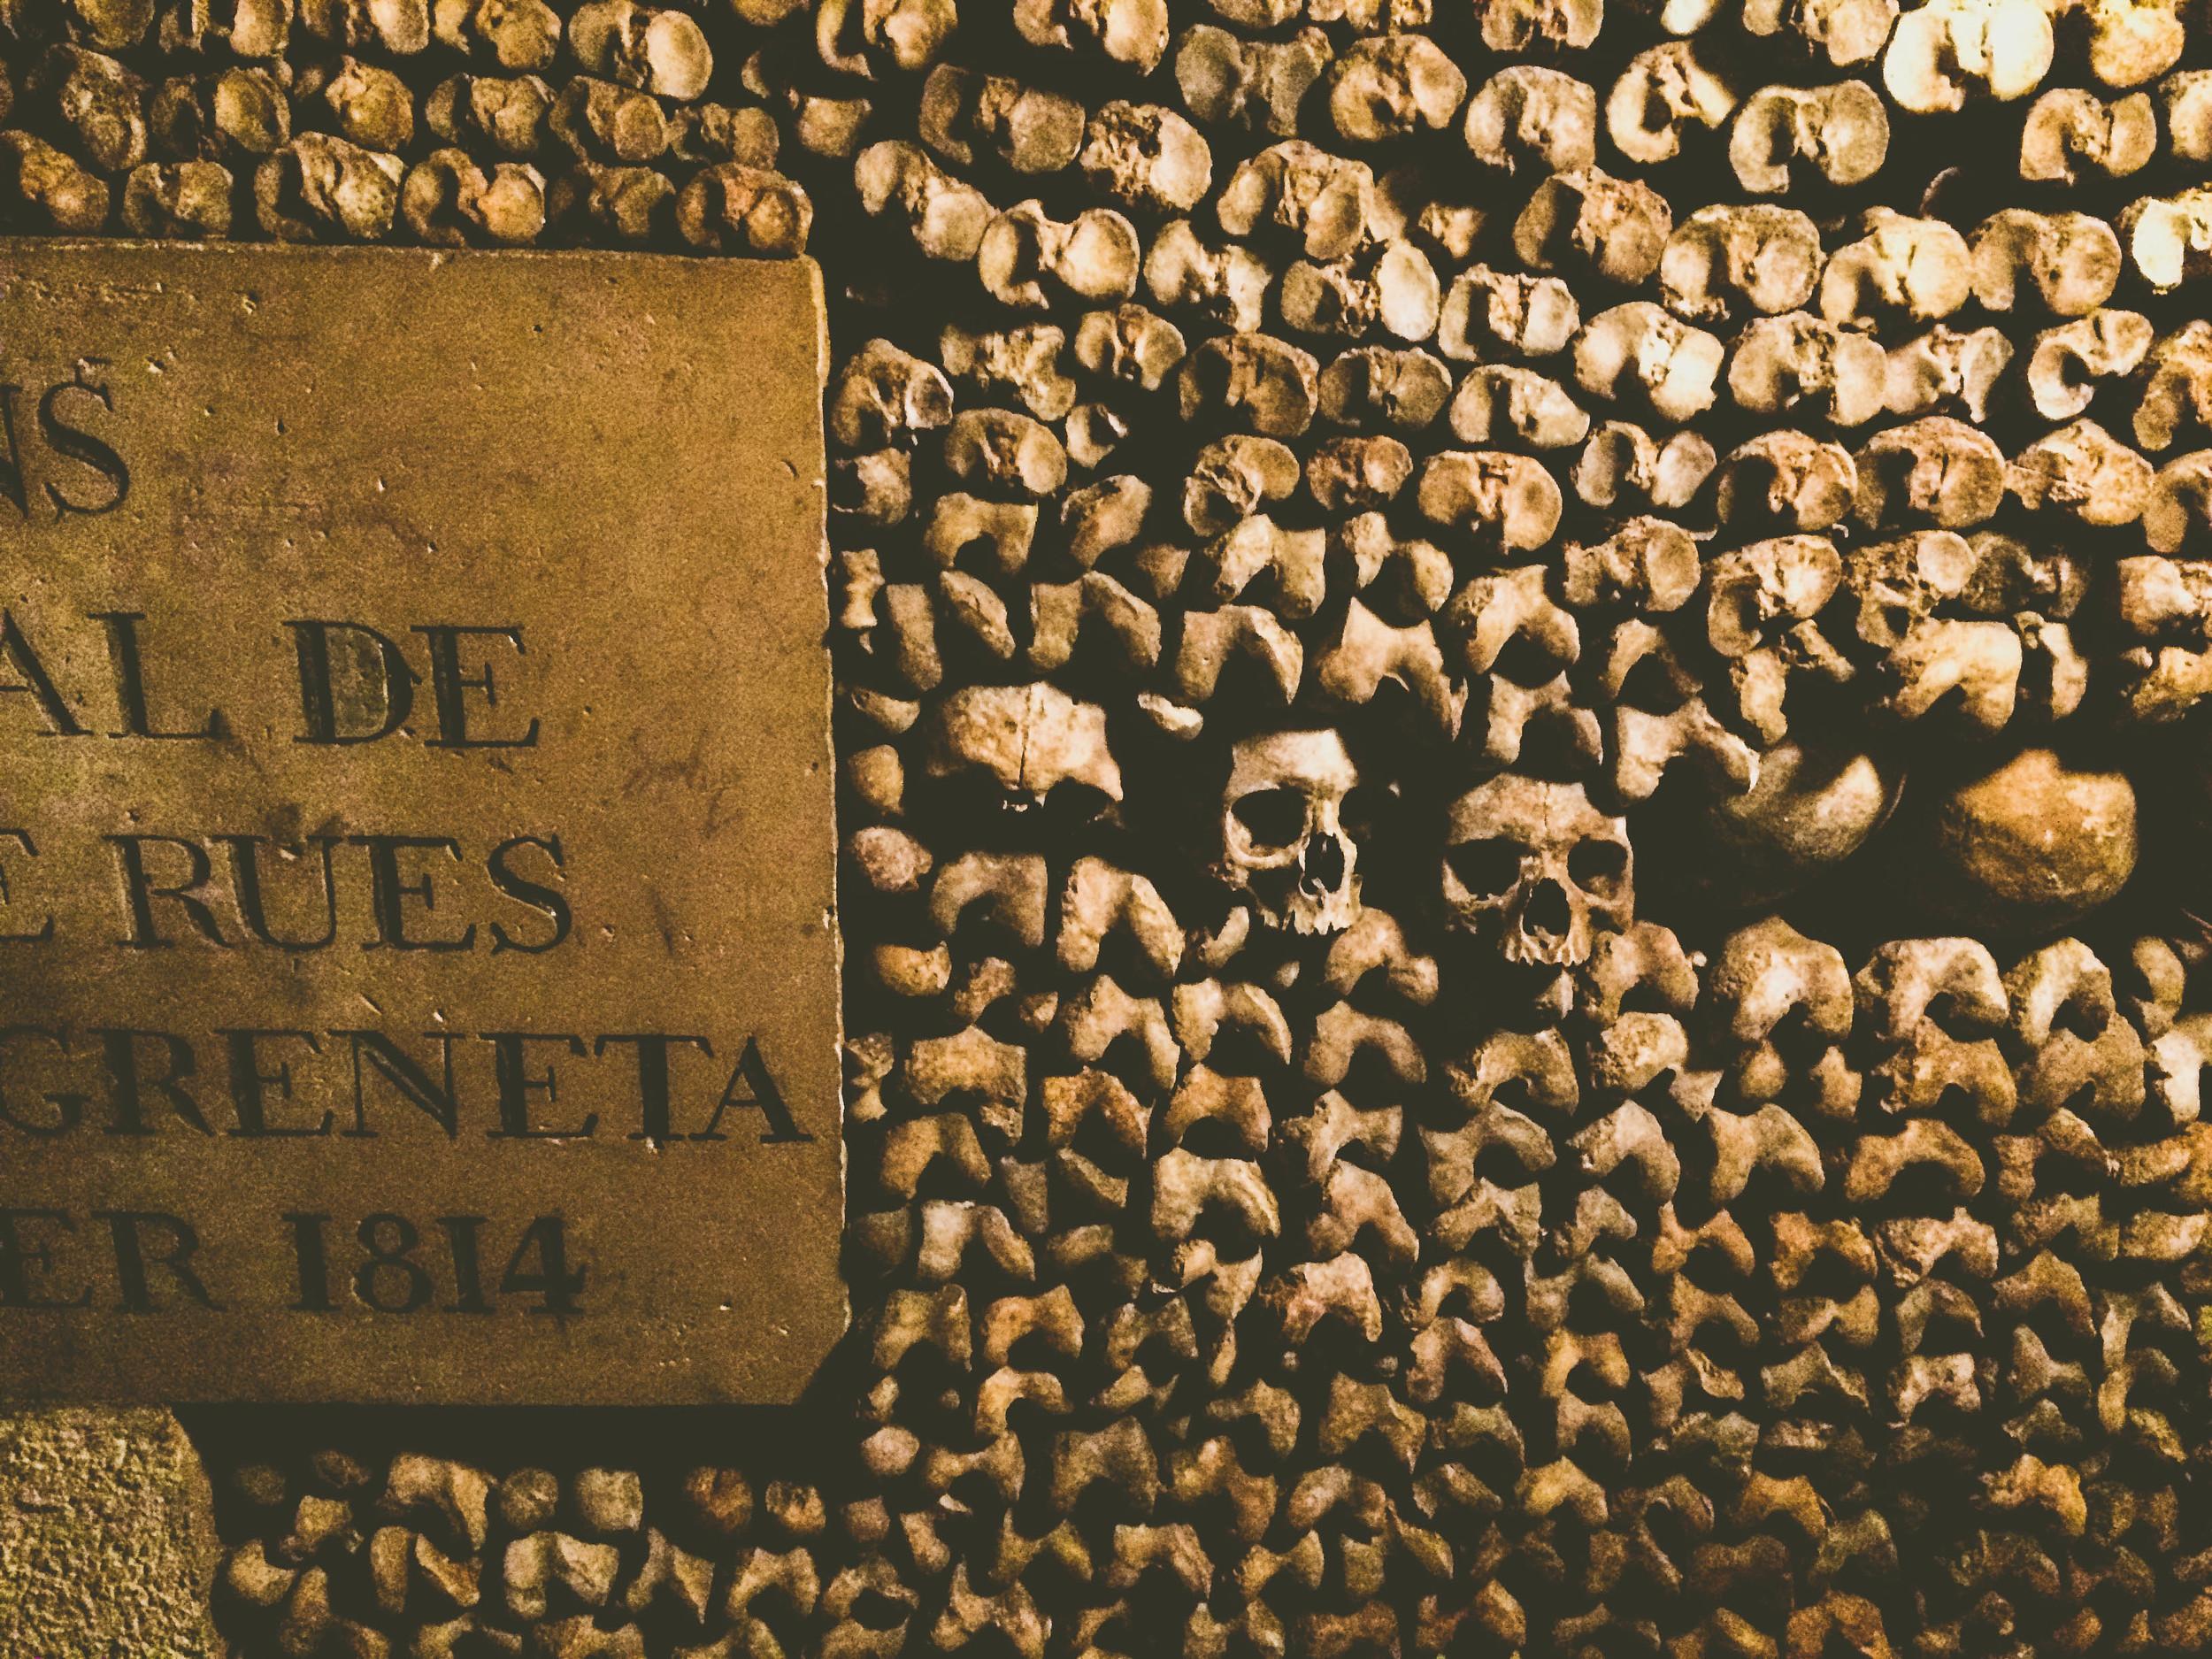 More bones in the catacombs.